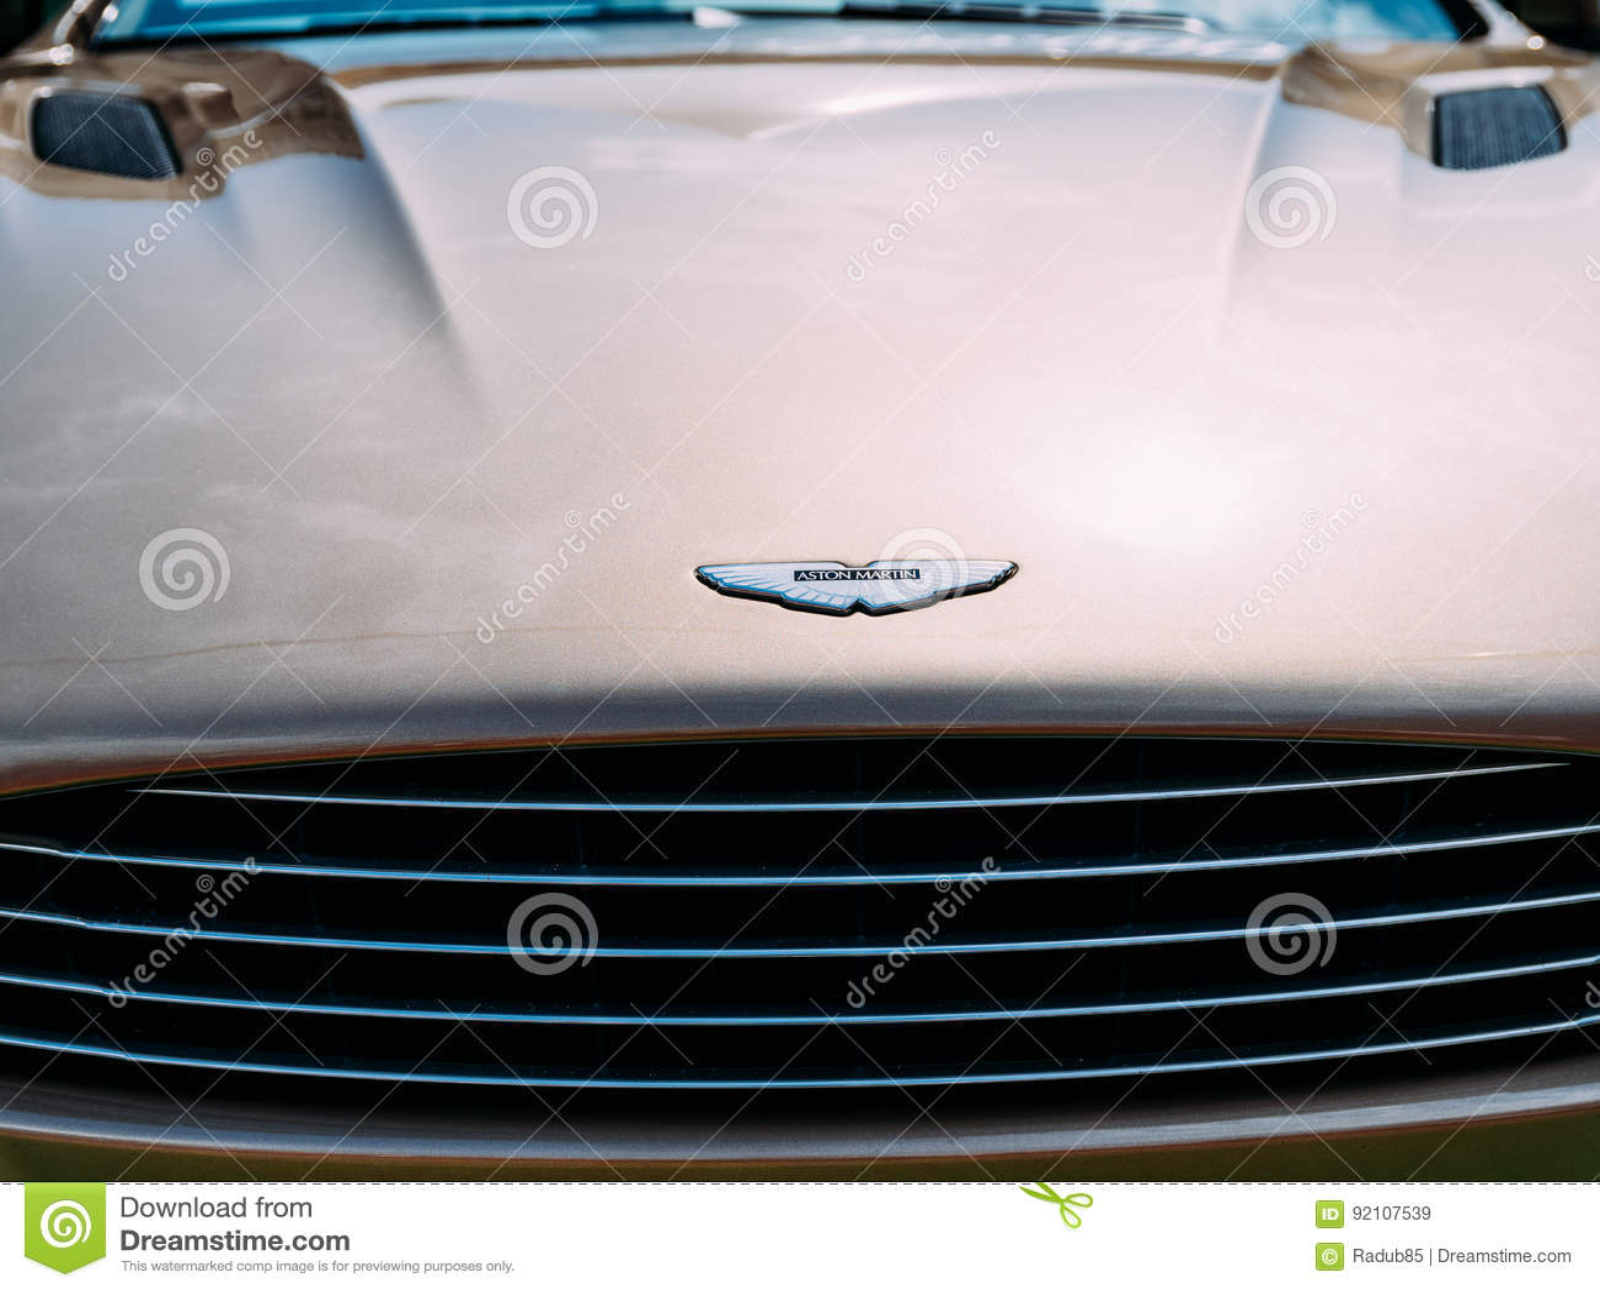 Aston Martin Car Editorial Stock Image Image Of Concept 92107539